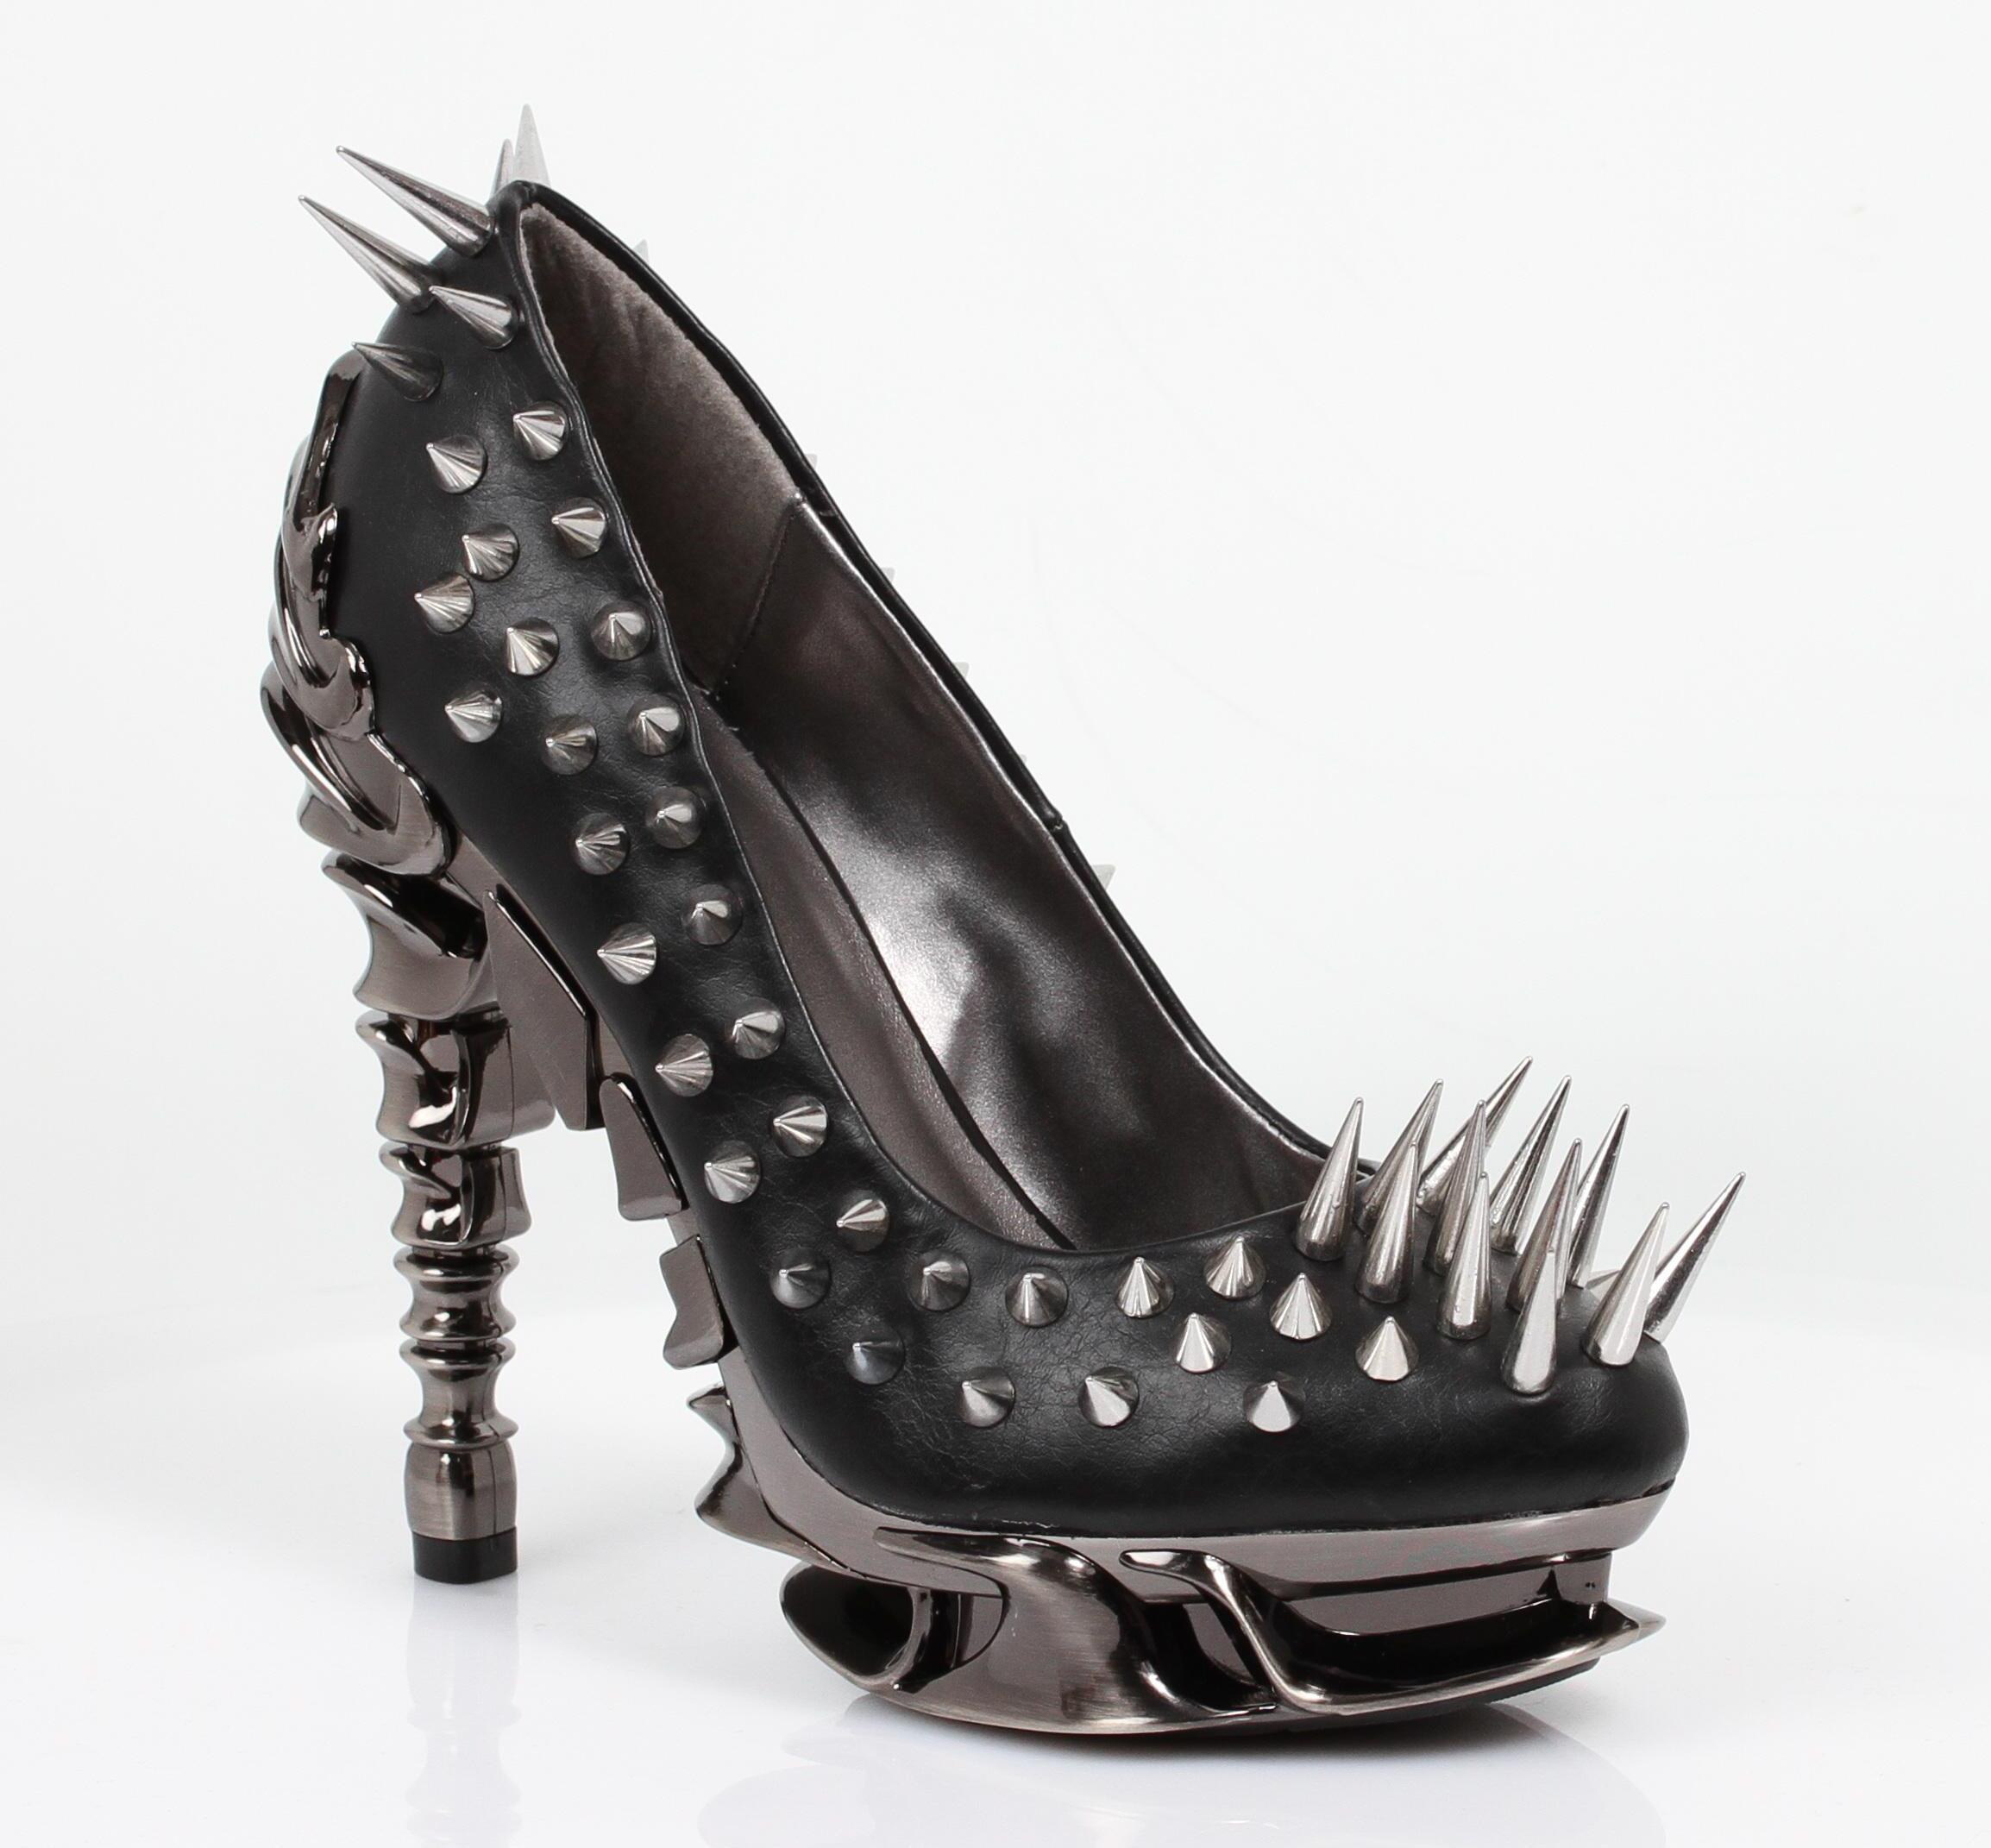 hades_shoes_zetta_chrome_plated_womens_spinal_heels_platforms_5.jpg